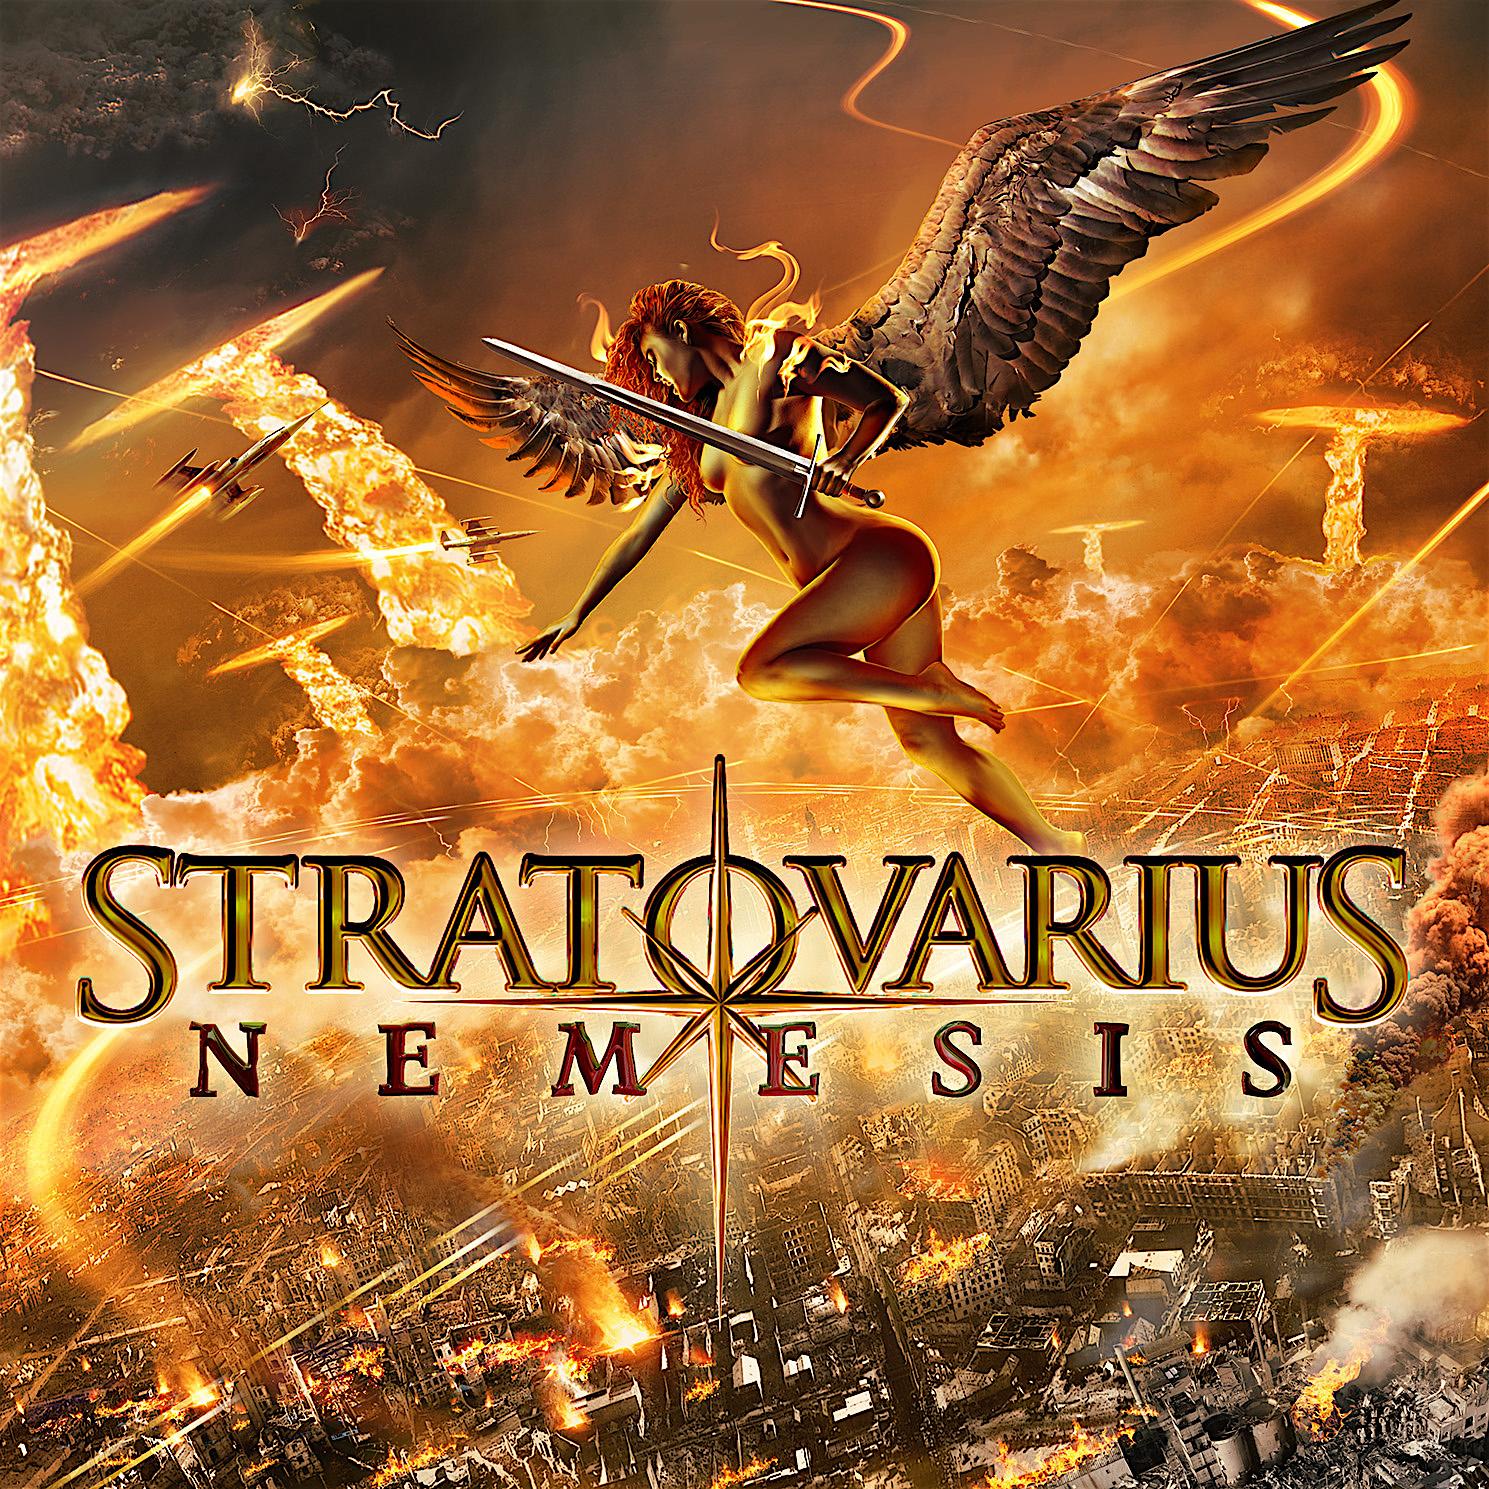 STRATOVARIUS - Nemesis cover